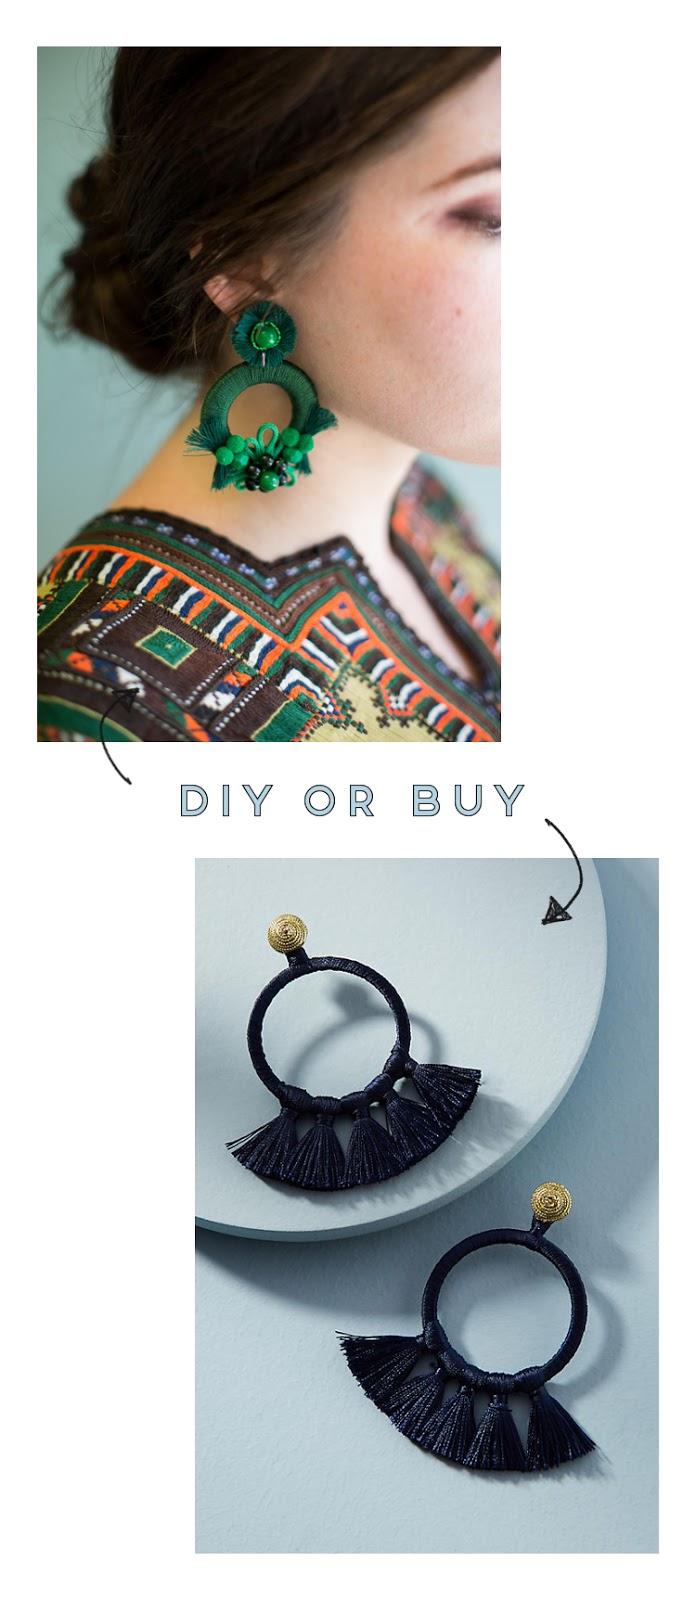 DIY OR BUY - STATEMENT EARRINGS. | Gathering Beauty